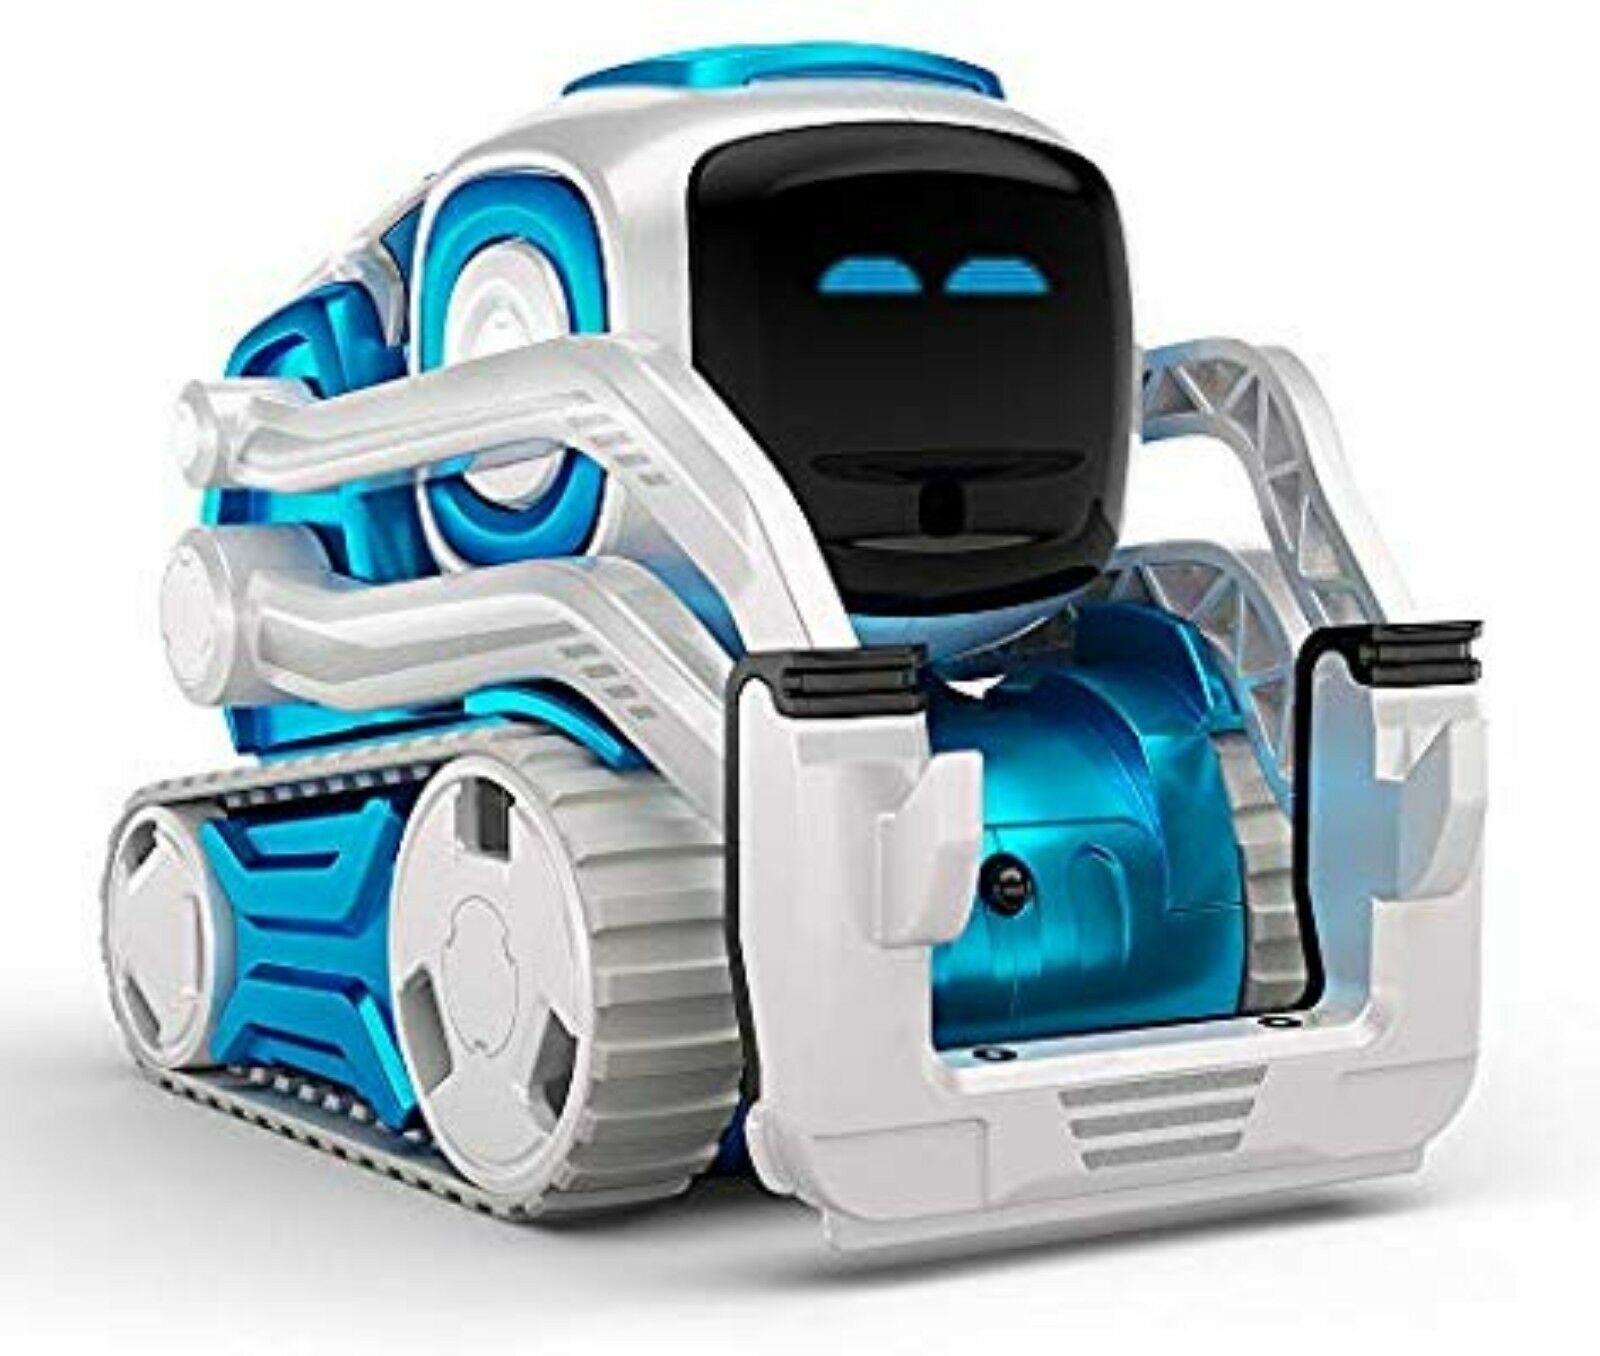 ANKI COZMO ROBOT ROBOT ROBOT  - Limited Edition bluee Xmas New 13cce7